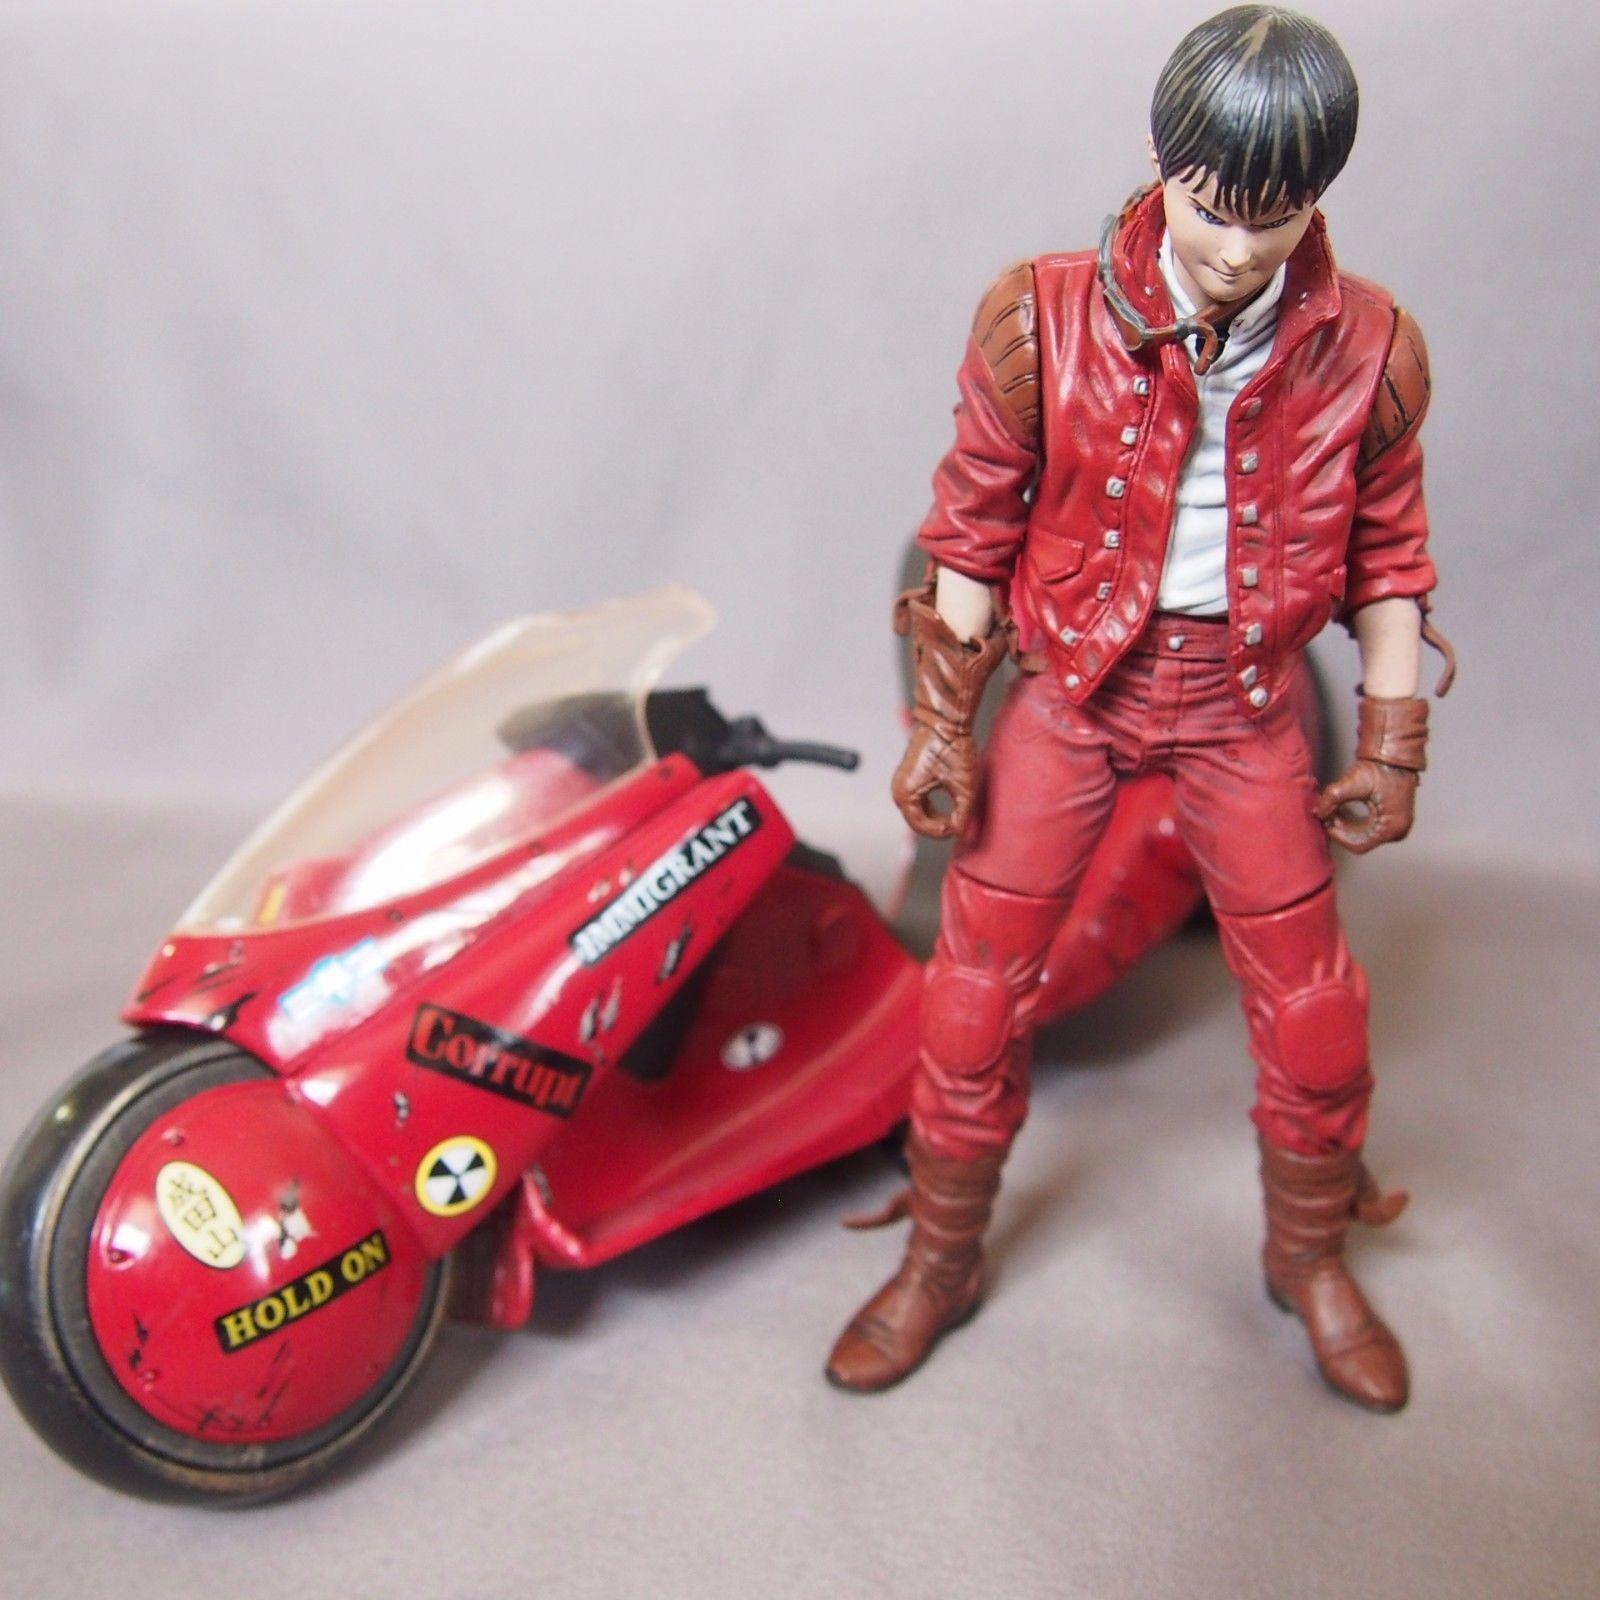 Rare-Akira-Kaneda-with-Motorcycle-Mcfarlane-Figure-good.jpg (1600×1600)